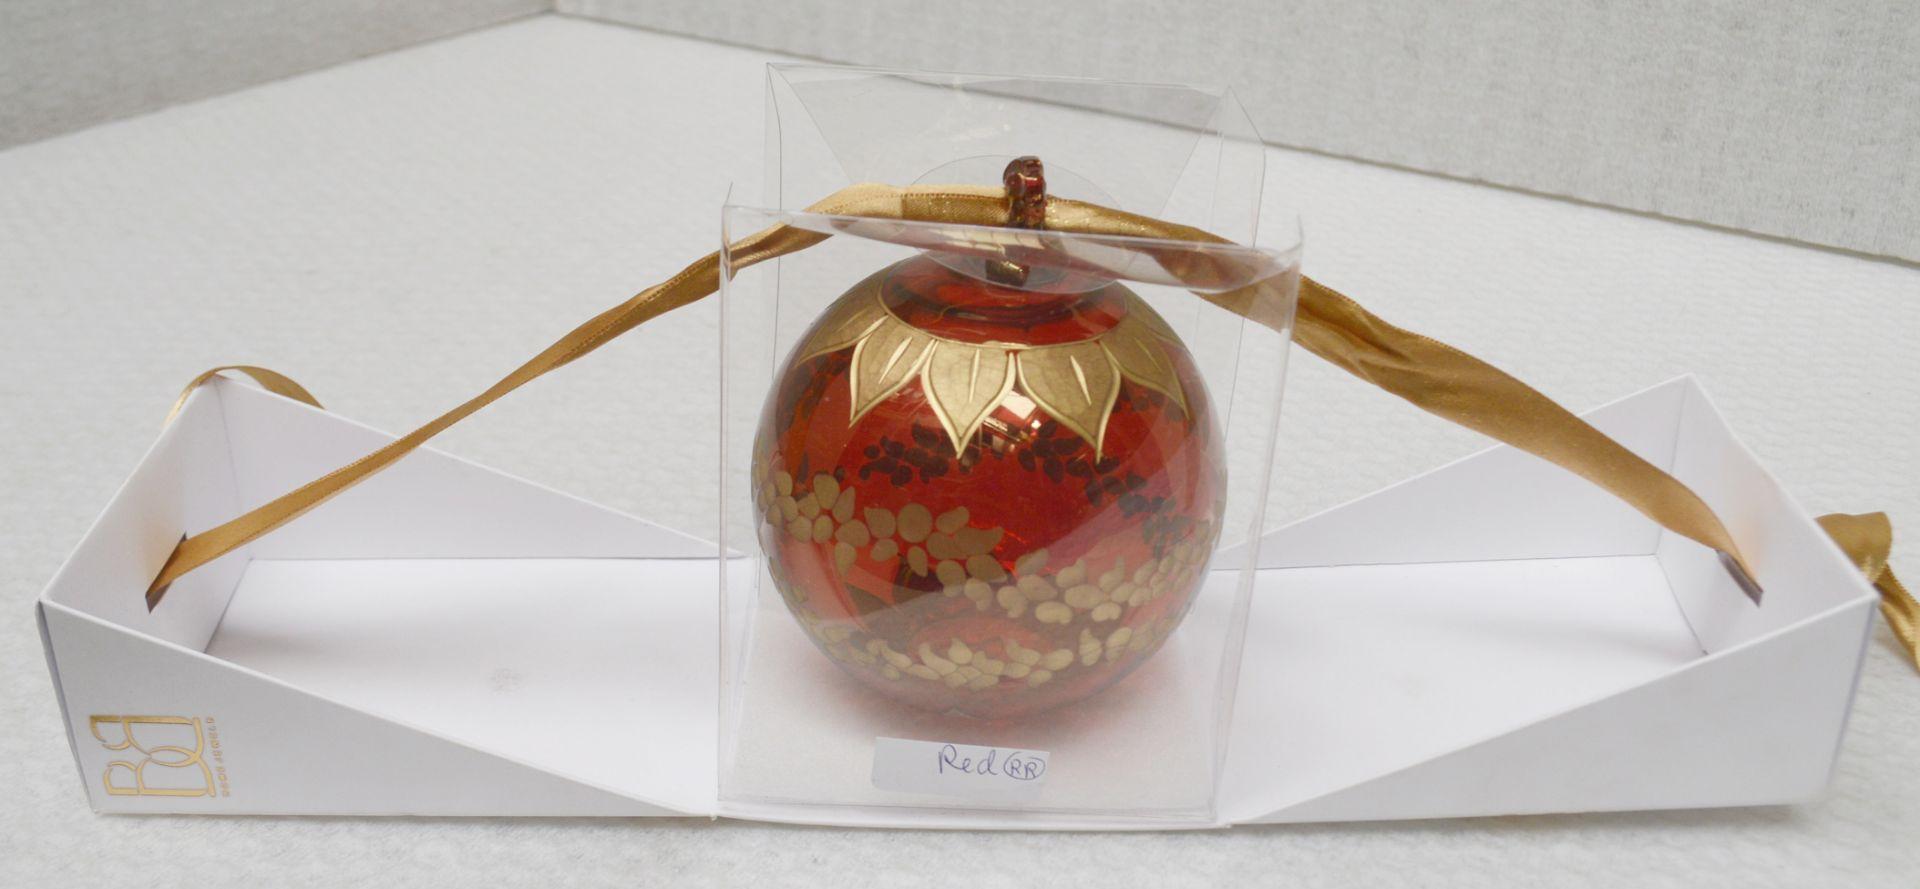 1 x BALDI 'Home Jewels' Italian Hand-crafted Artisan Christmas Tree Decoration - RRP £114.00 - Image 4 of 5